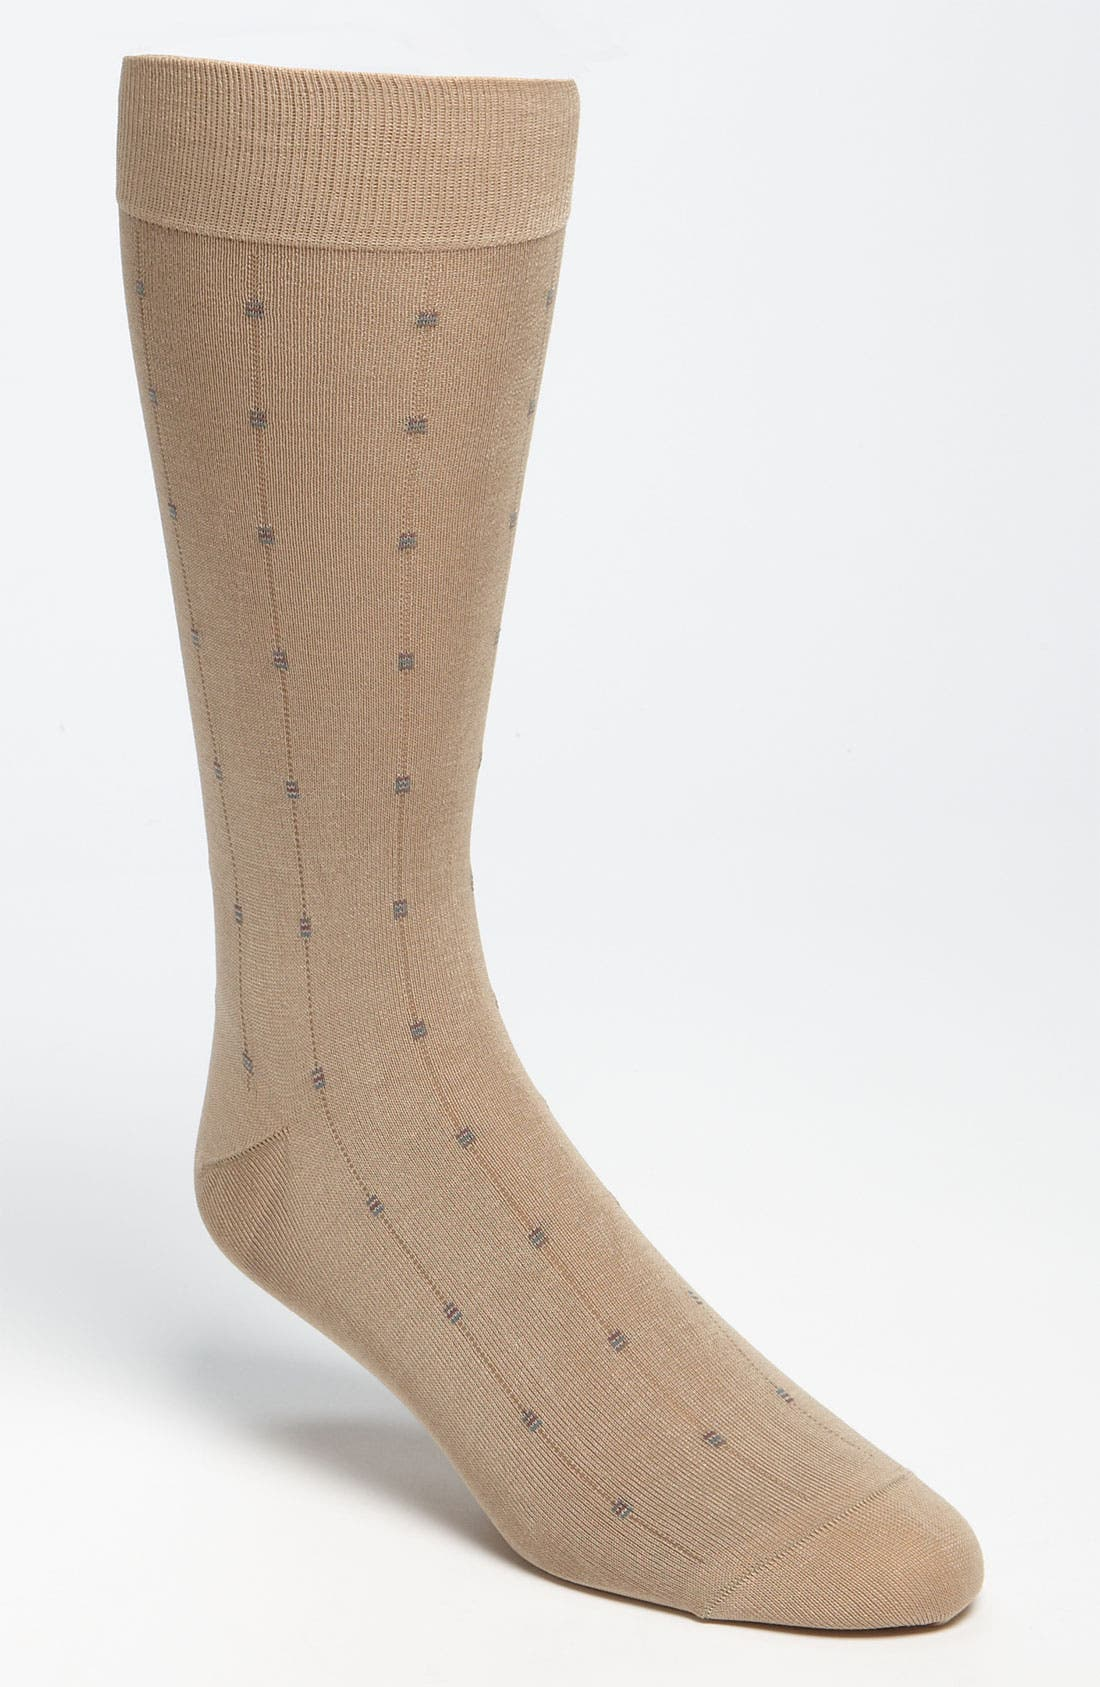 Alternate Image 1 Selected - Pantherella 'Bellringer' Socks